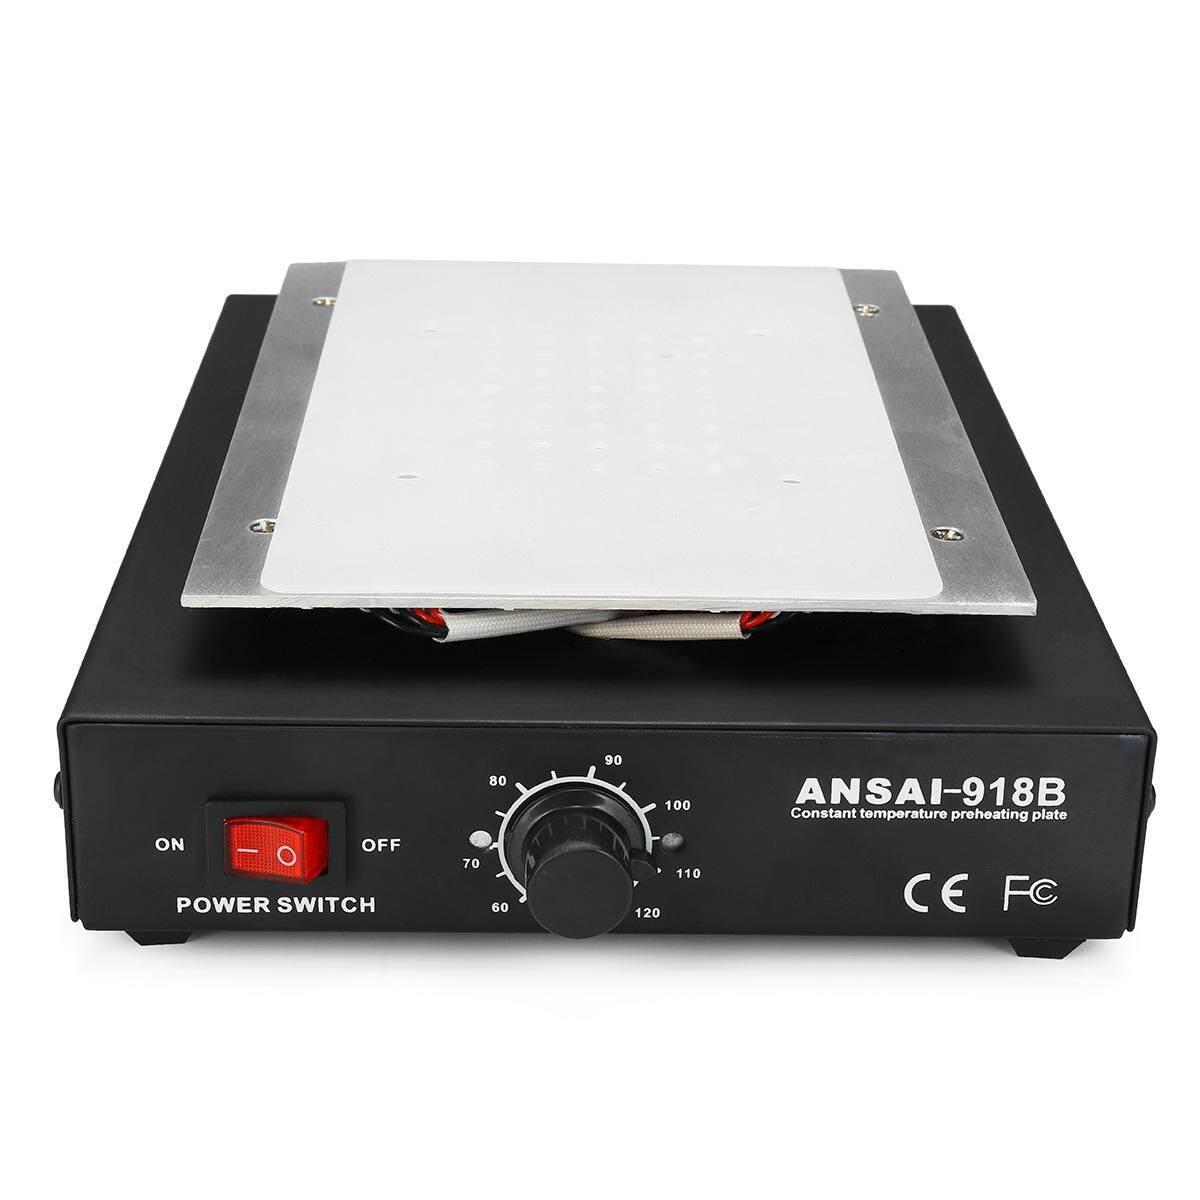 Layar LCD Separator Pemanasan Pelat Platform Kaca Penghapusan TransFlash Mikro SD 110 V US Plug-Intl